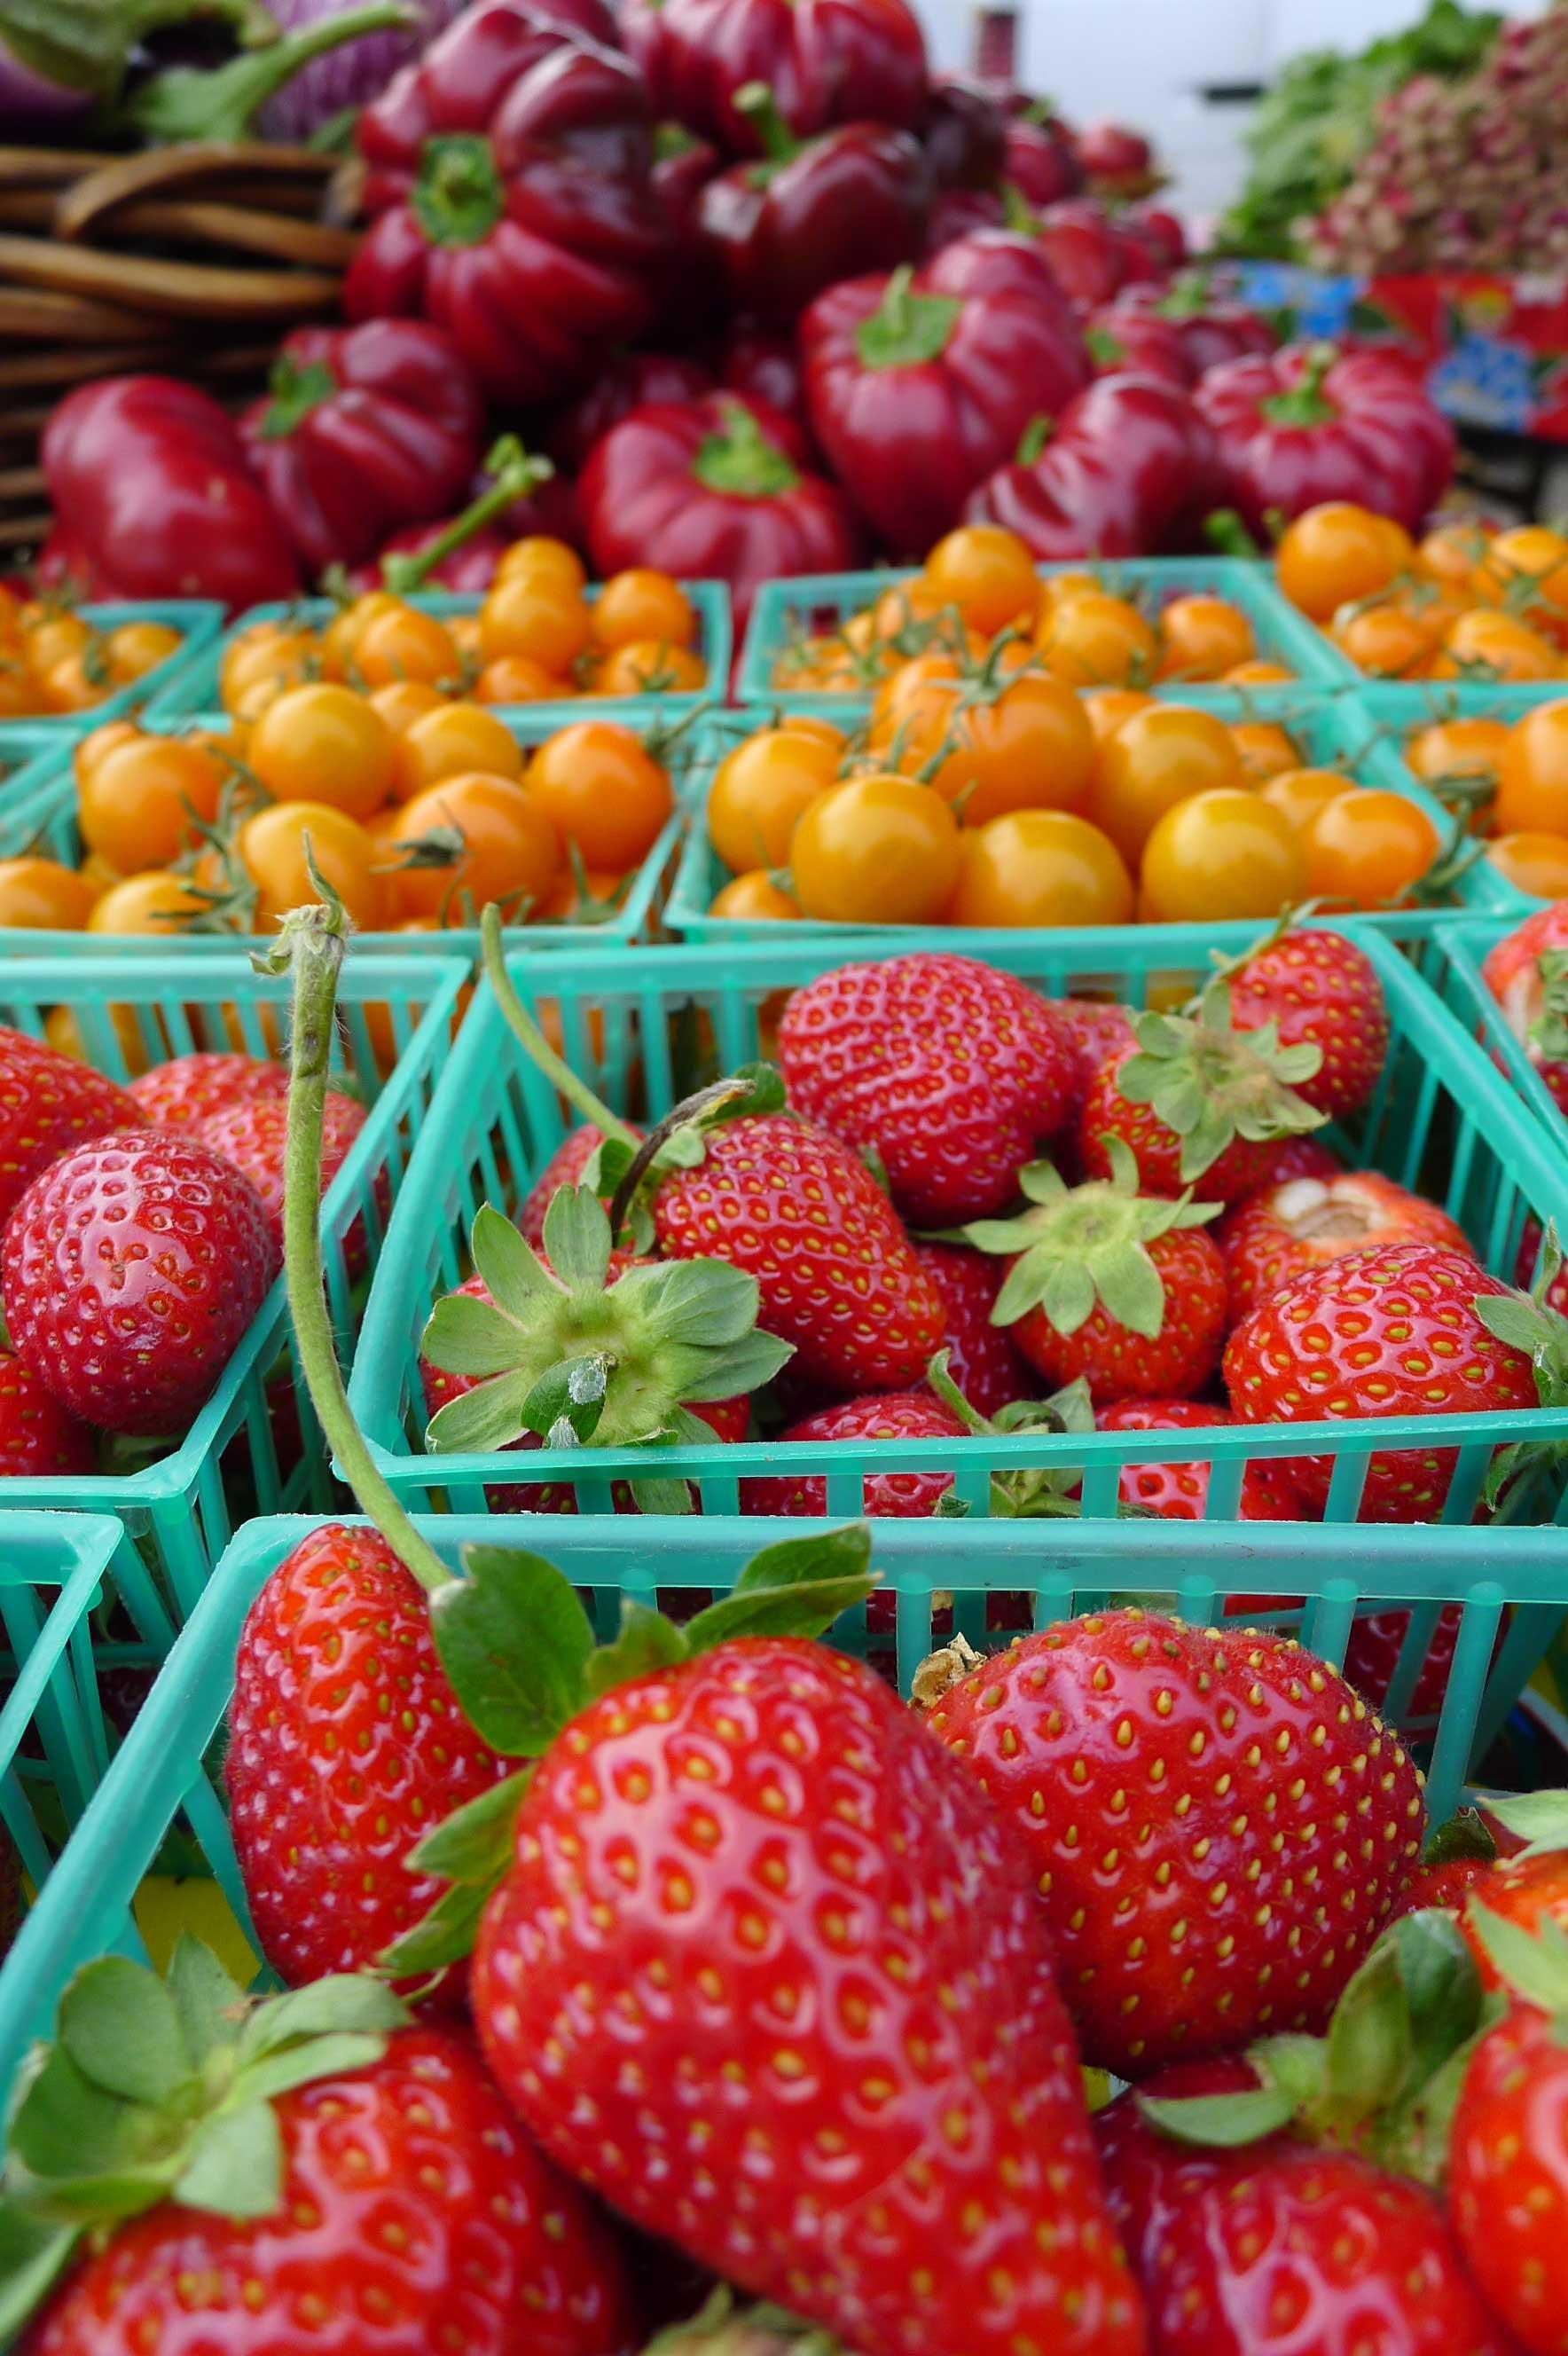 Online Fresh Produce Market